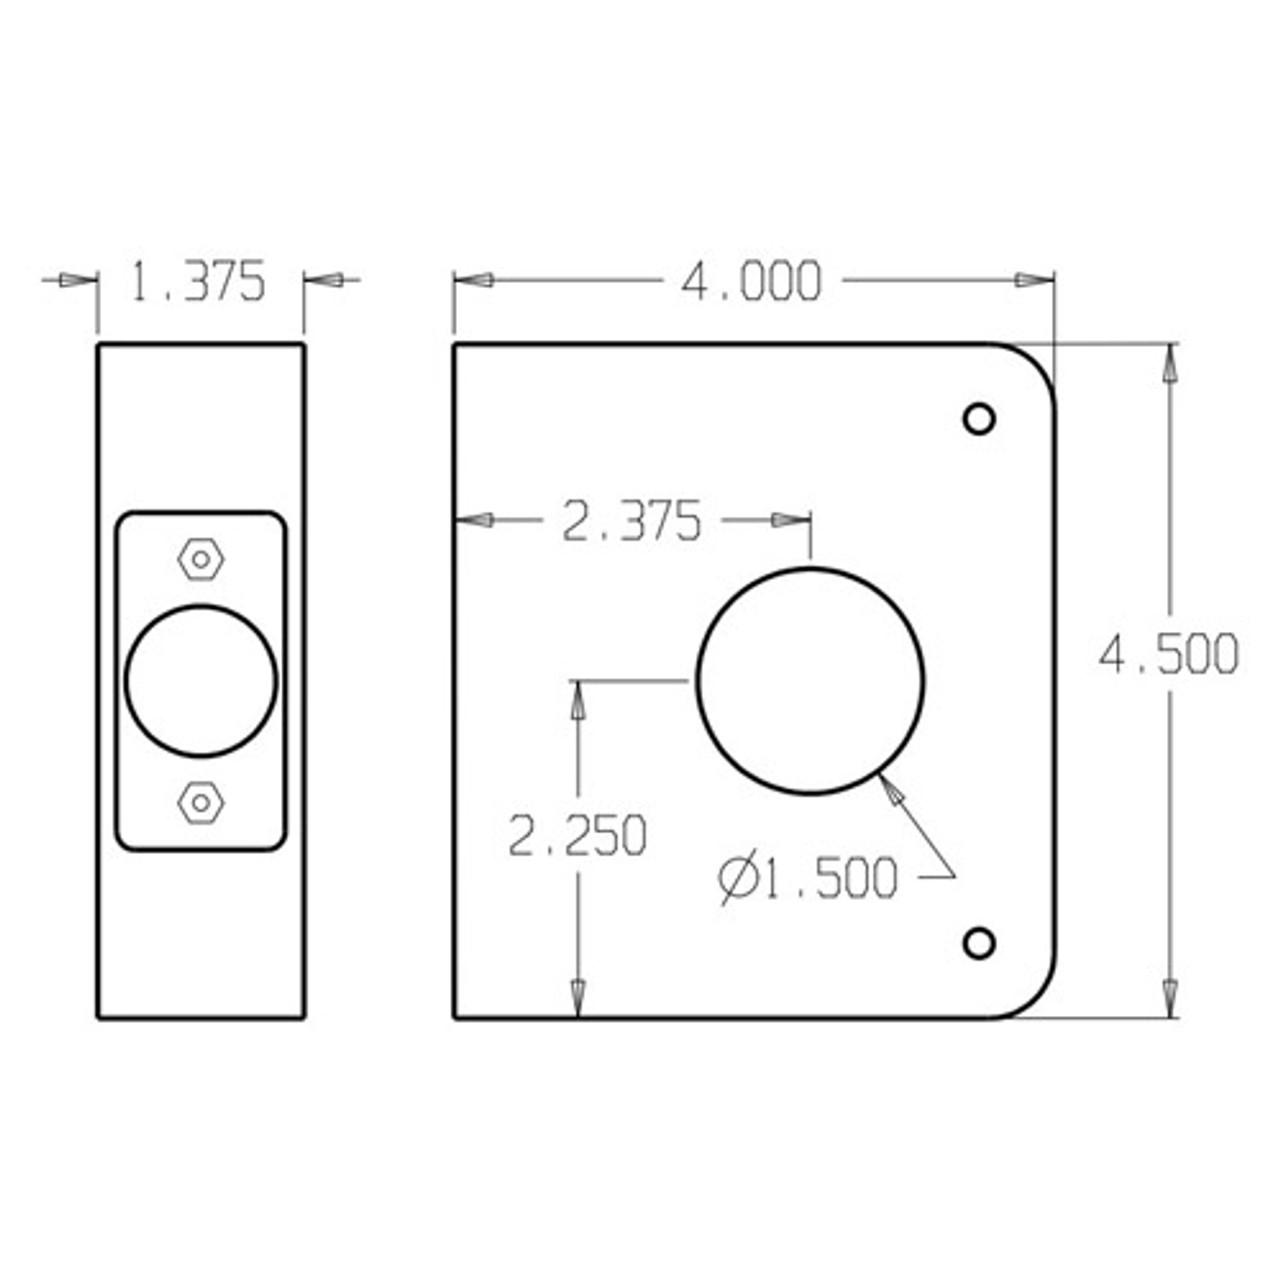 5-10B-CW Don Jo Classic Wrap Around Plate Dimensional View